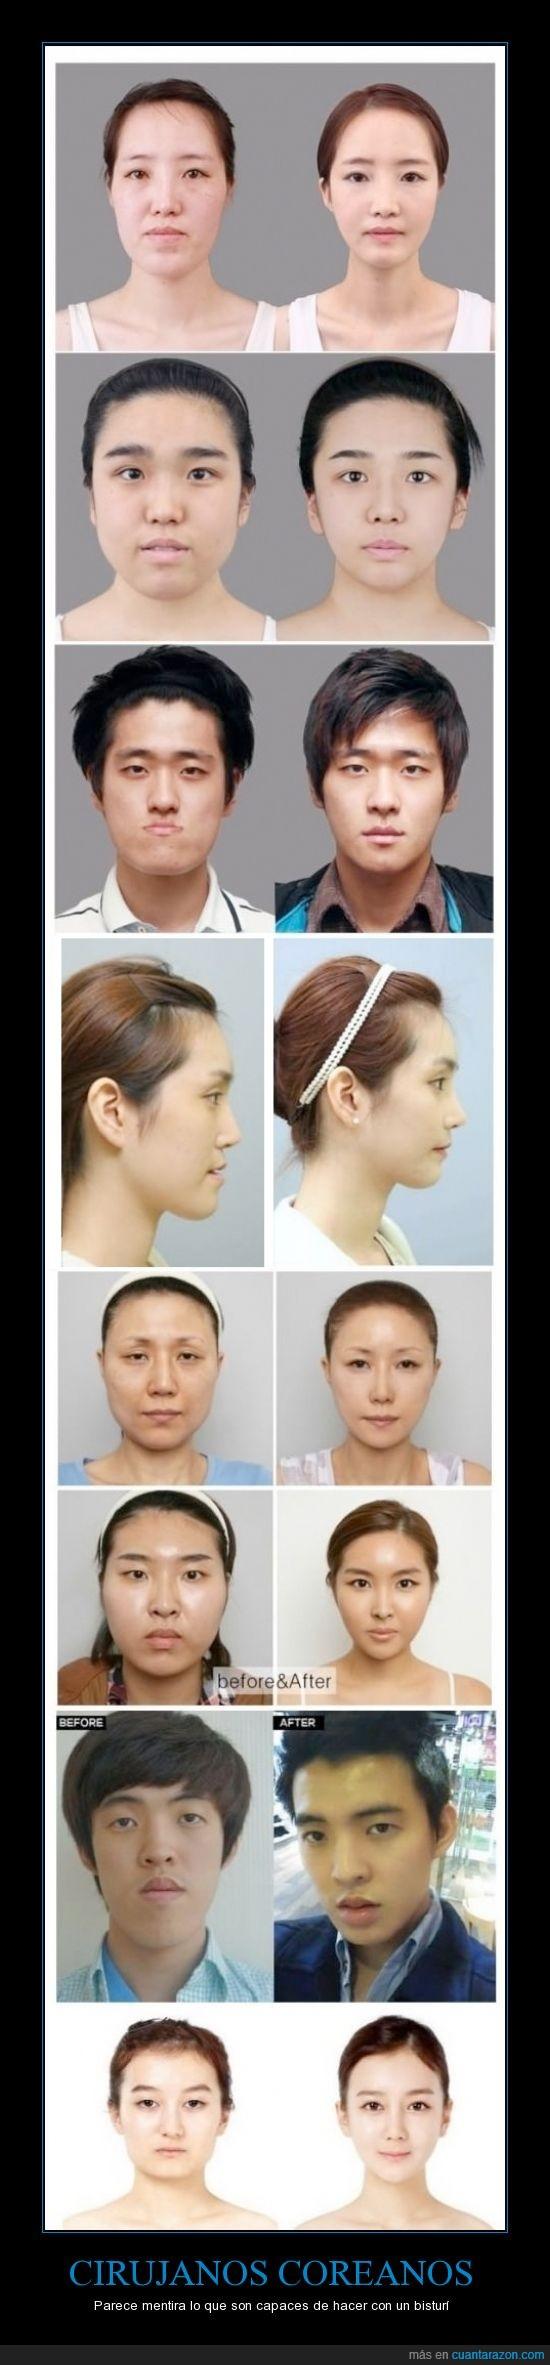 cirujias,feos,guapo,increible,korea,mandibula,operacion,plasticas